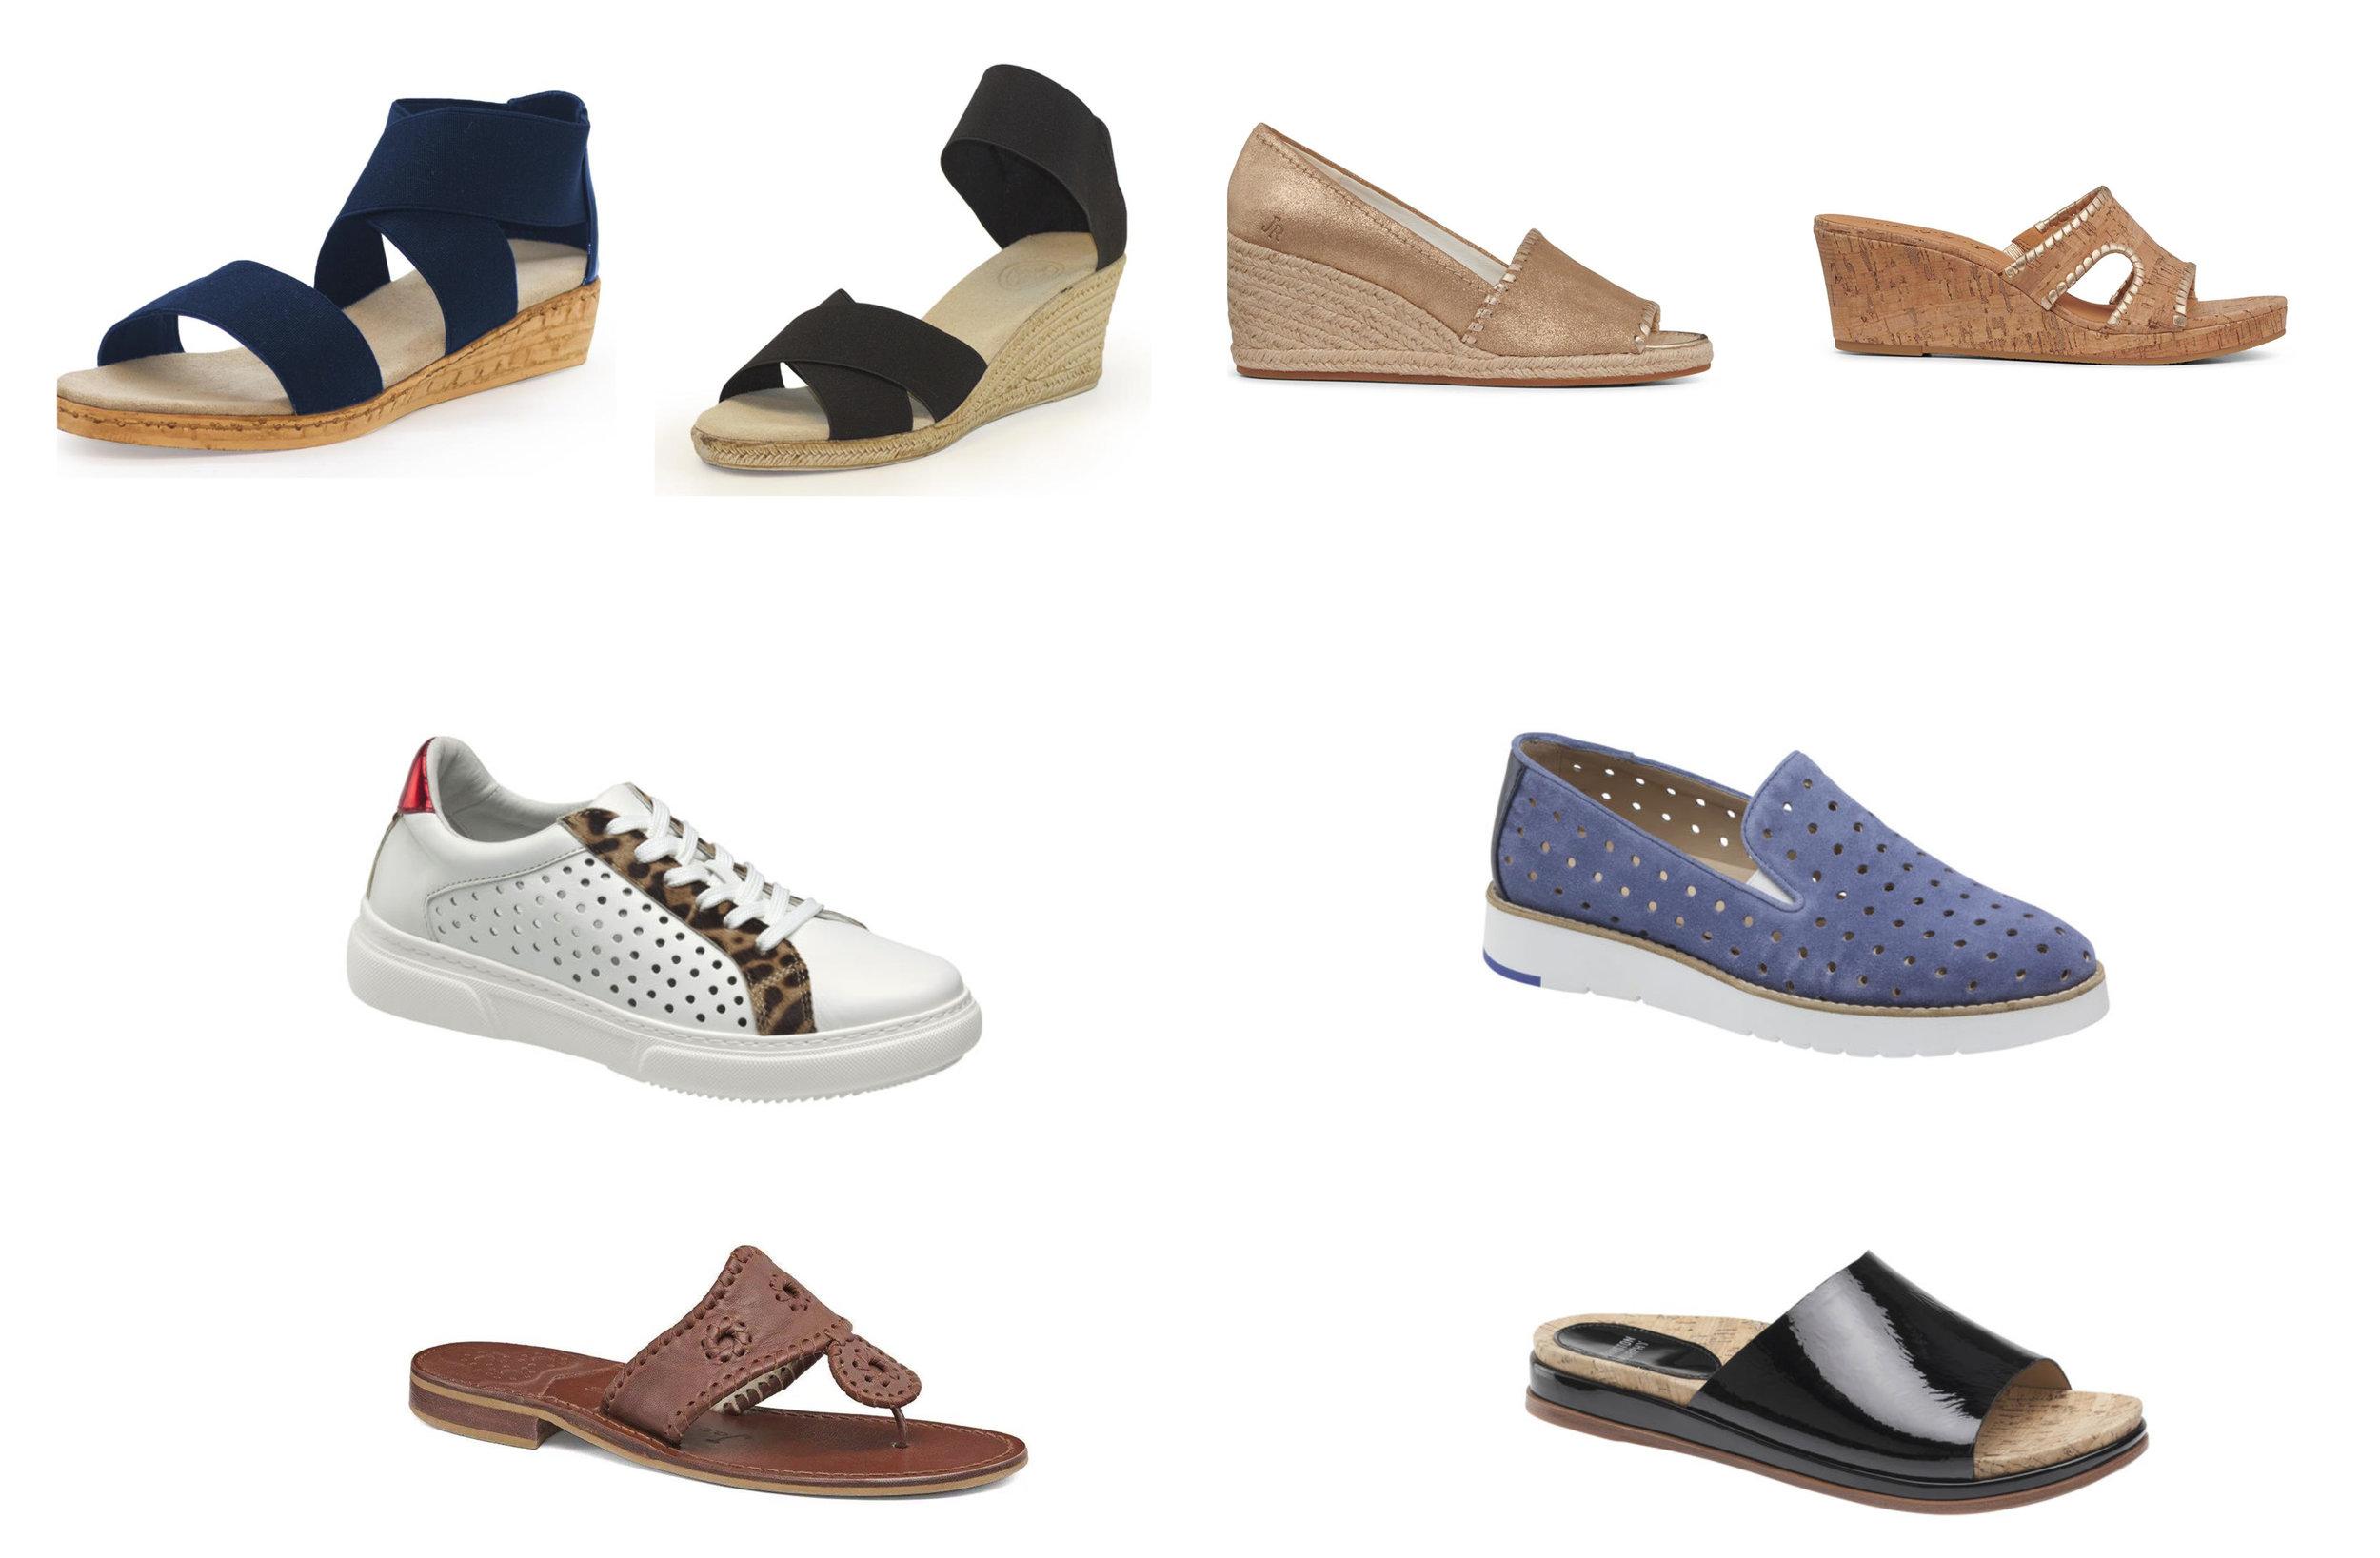 Top Row: Charleston Shoe Company, Jack Rogers   Middle Row: Johnston & Murphy   Bottom Row: Jack Rogers, Johnston & Murphy